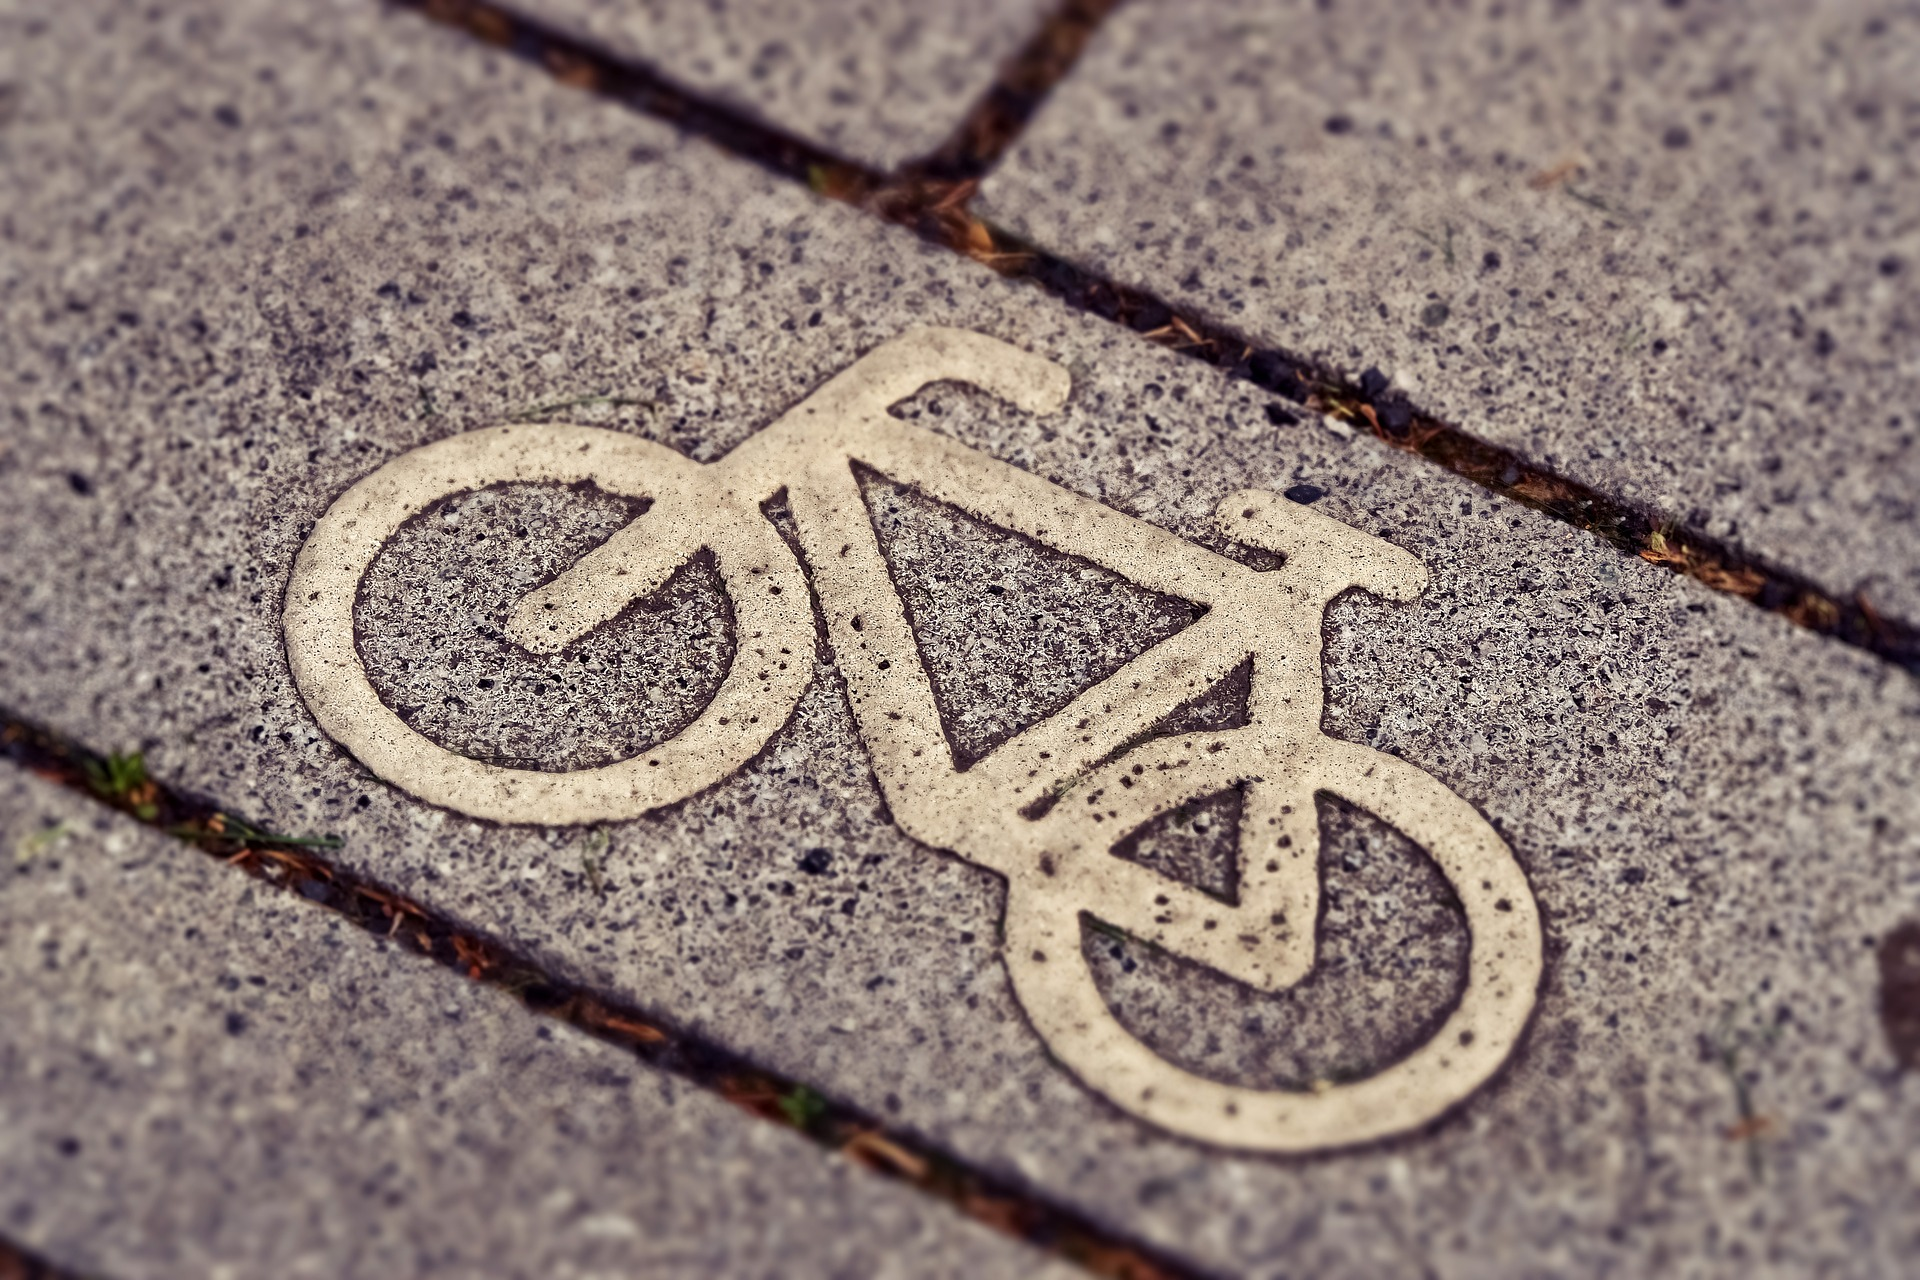 Glasgow introduces fleet of electric bikes across city